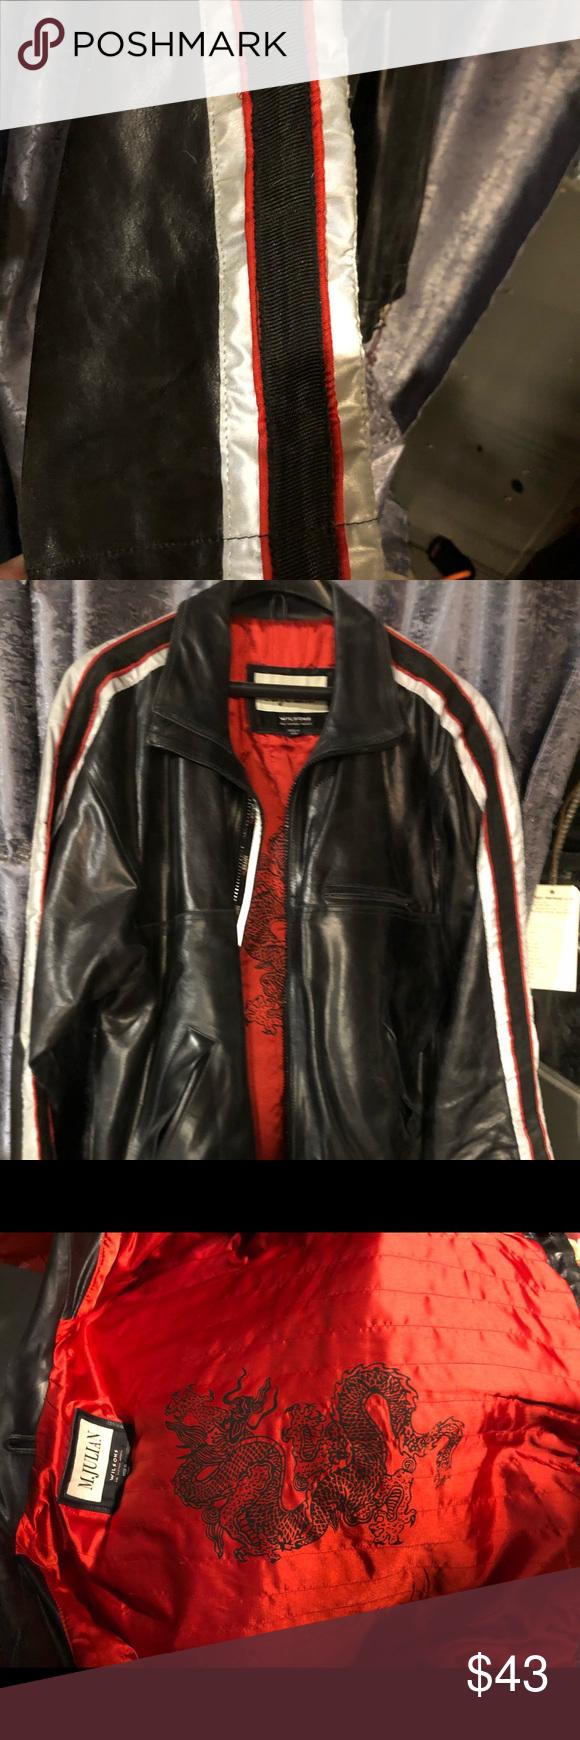 Wilson M Julian Black Leather Jacket Coat Large Black Leather Jacket Leather Jacket Wilsons Leather Jacket